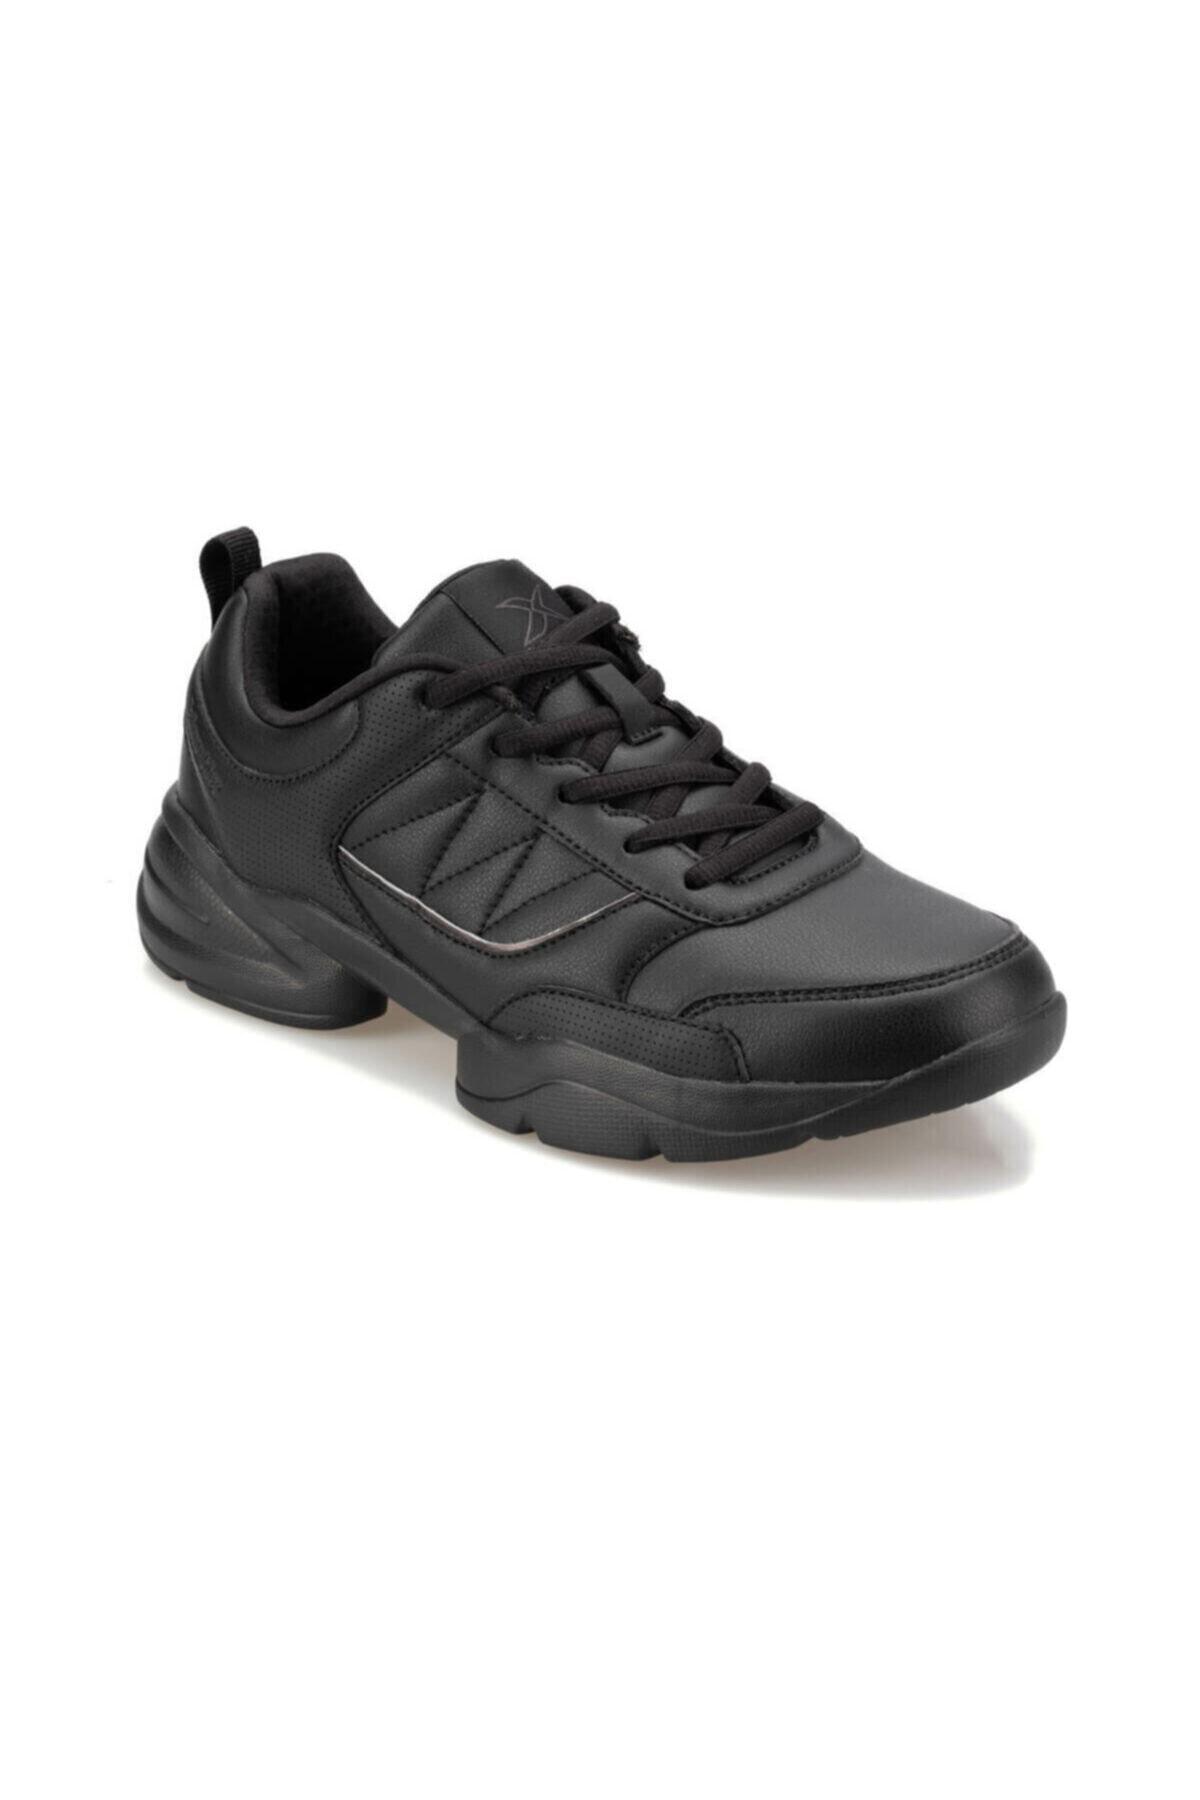 کفش مخصوص دویدن خفن برند کینتیکس kinetix رنگ مشکی کد ty29740609